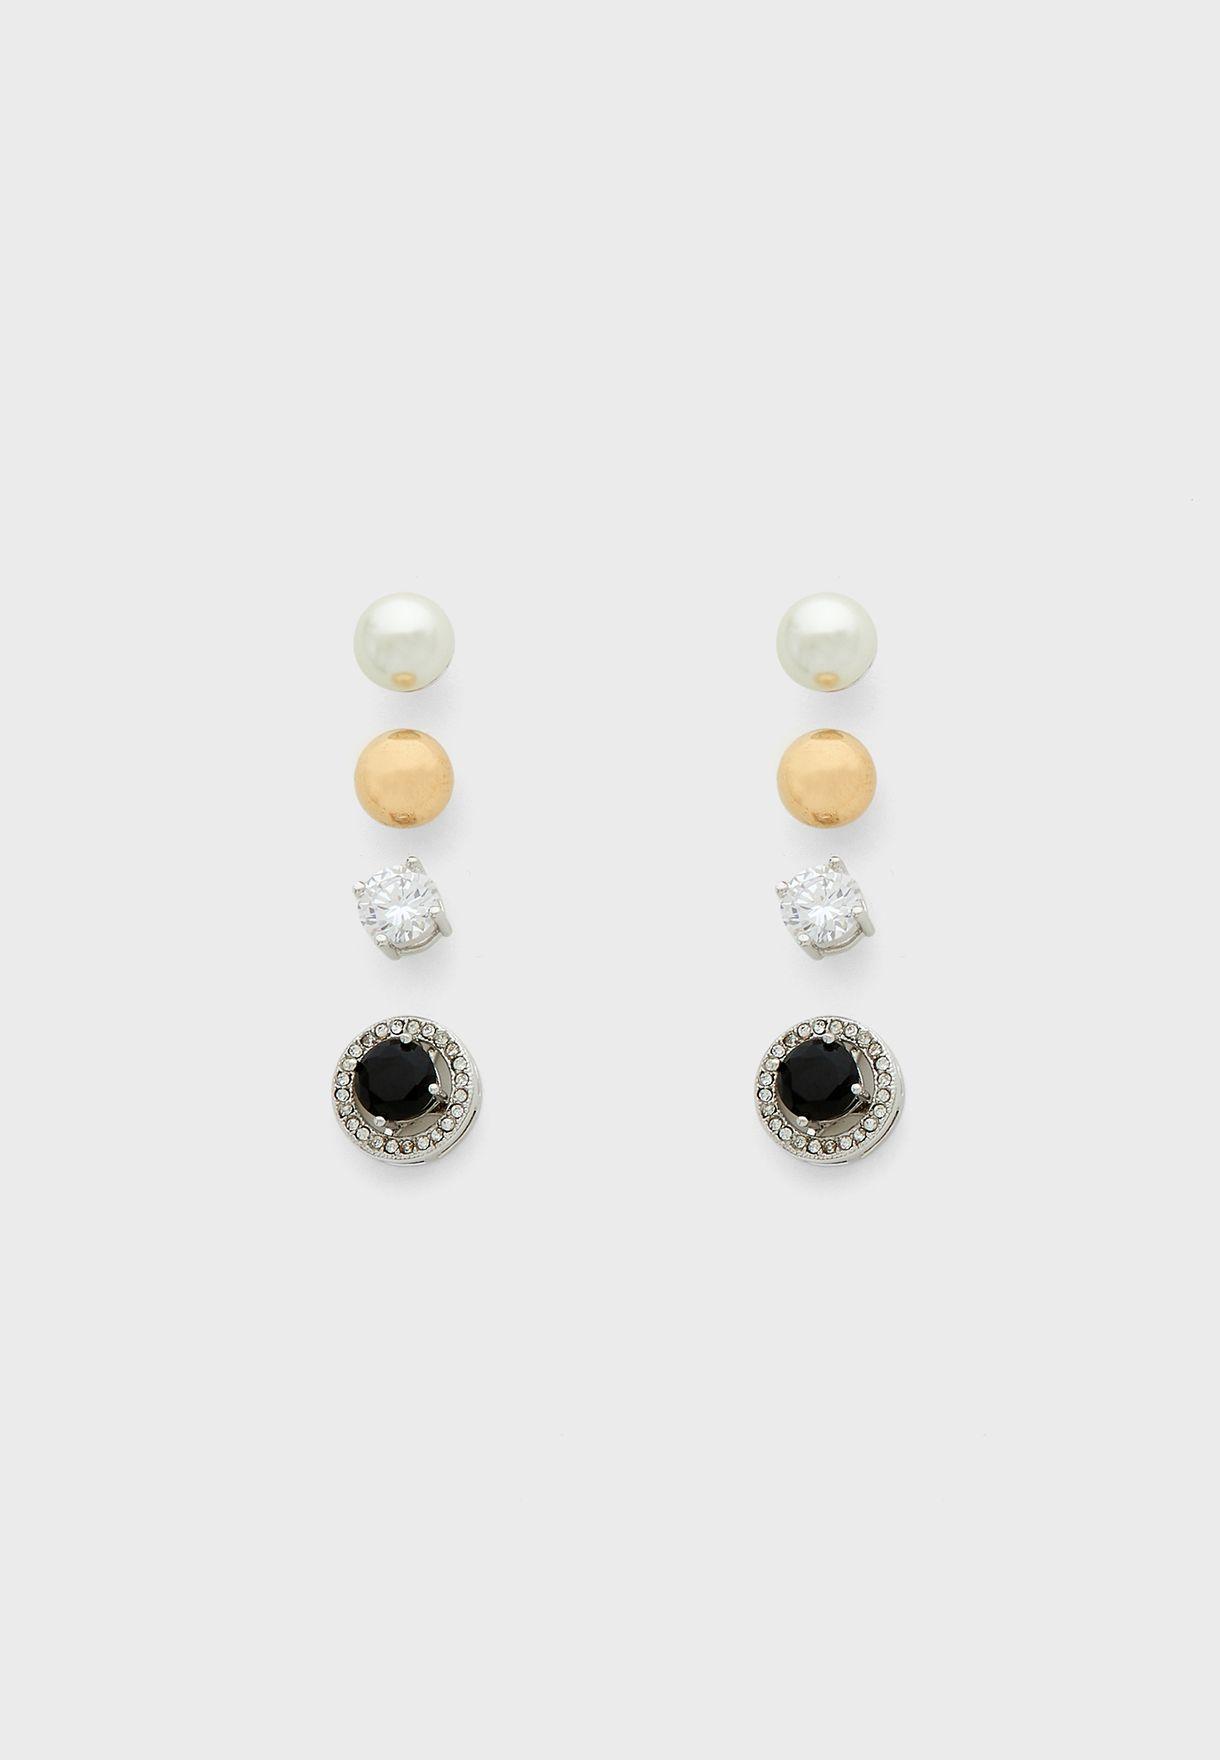 Fourever Interchangeable Earrings Set